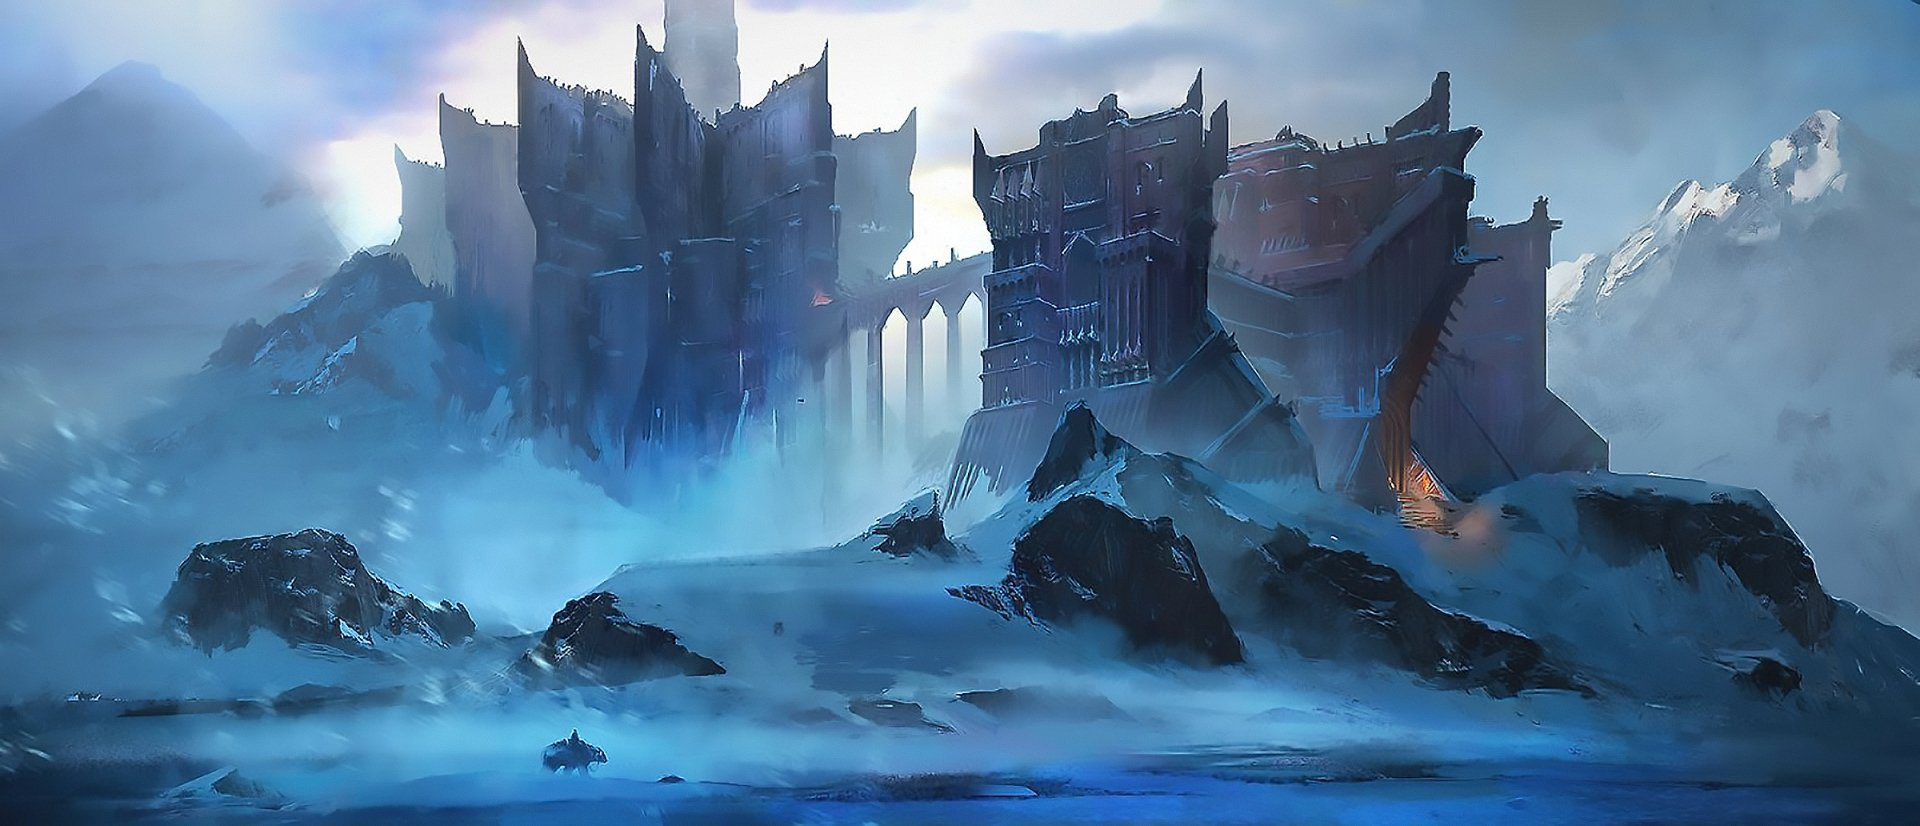 Fantasy - Castle  Ice Wallpaper